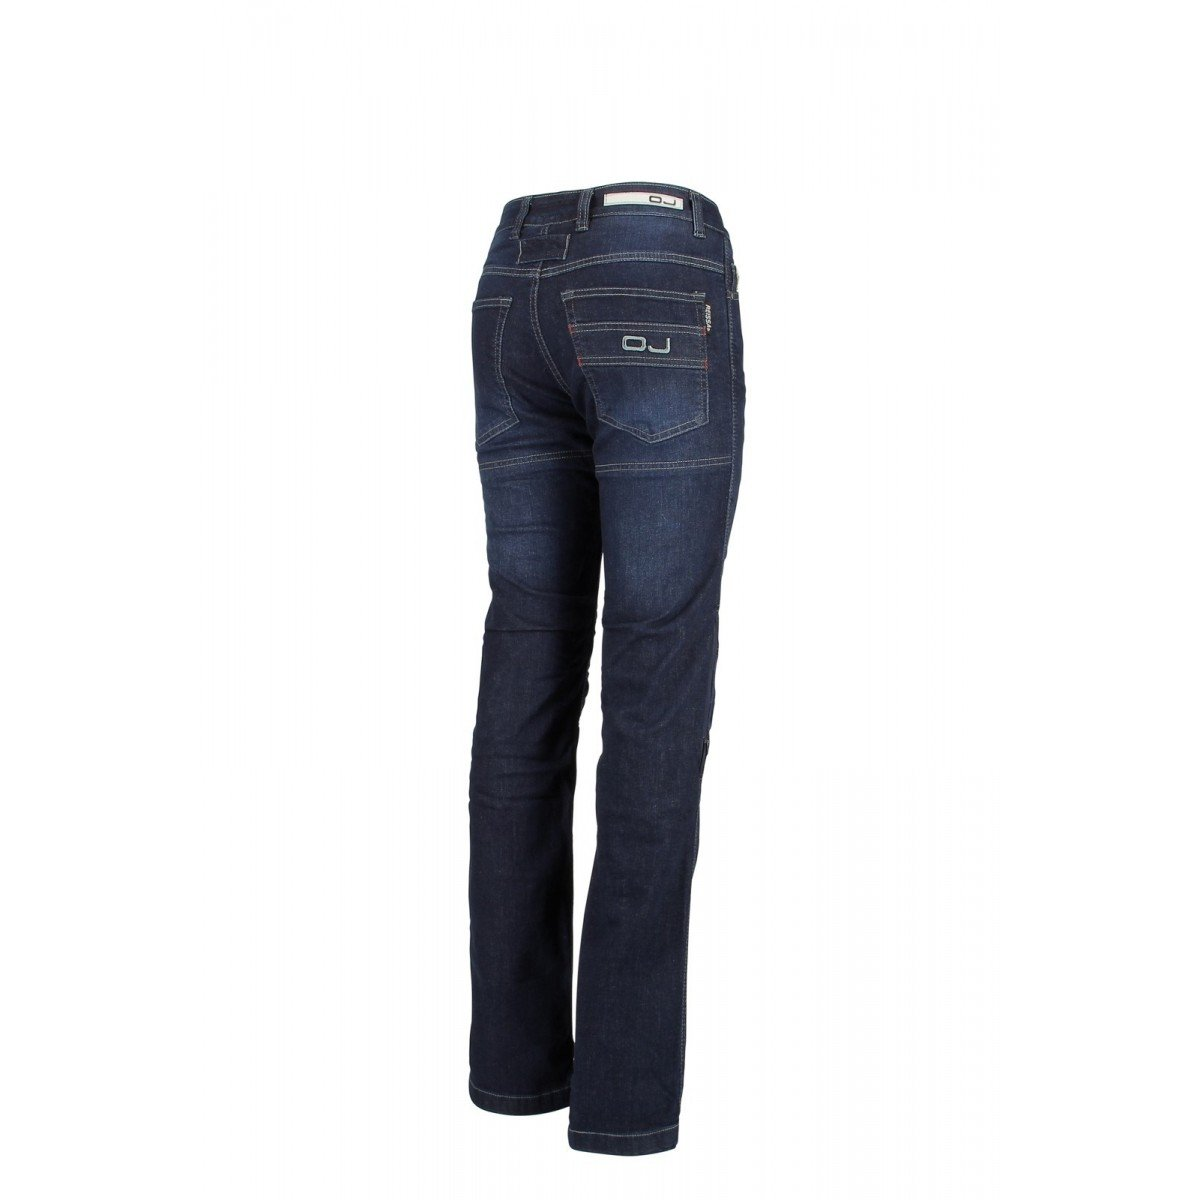 OJ Bluster Lady Jeans 4 Estaciones Impermeable De Tejido ...